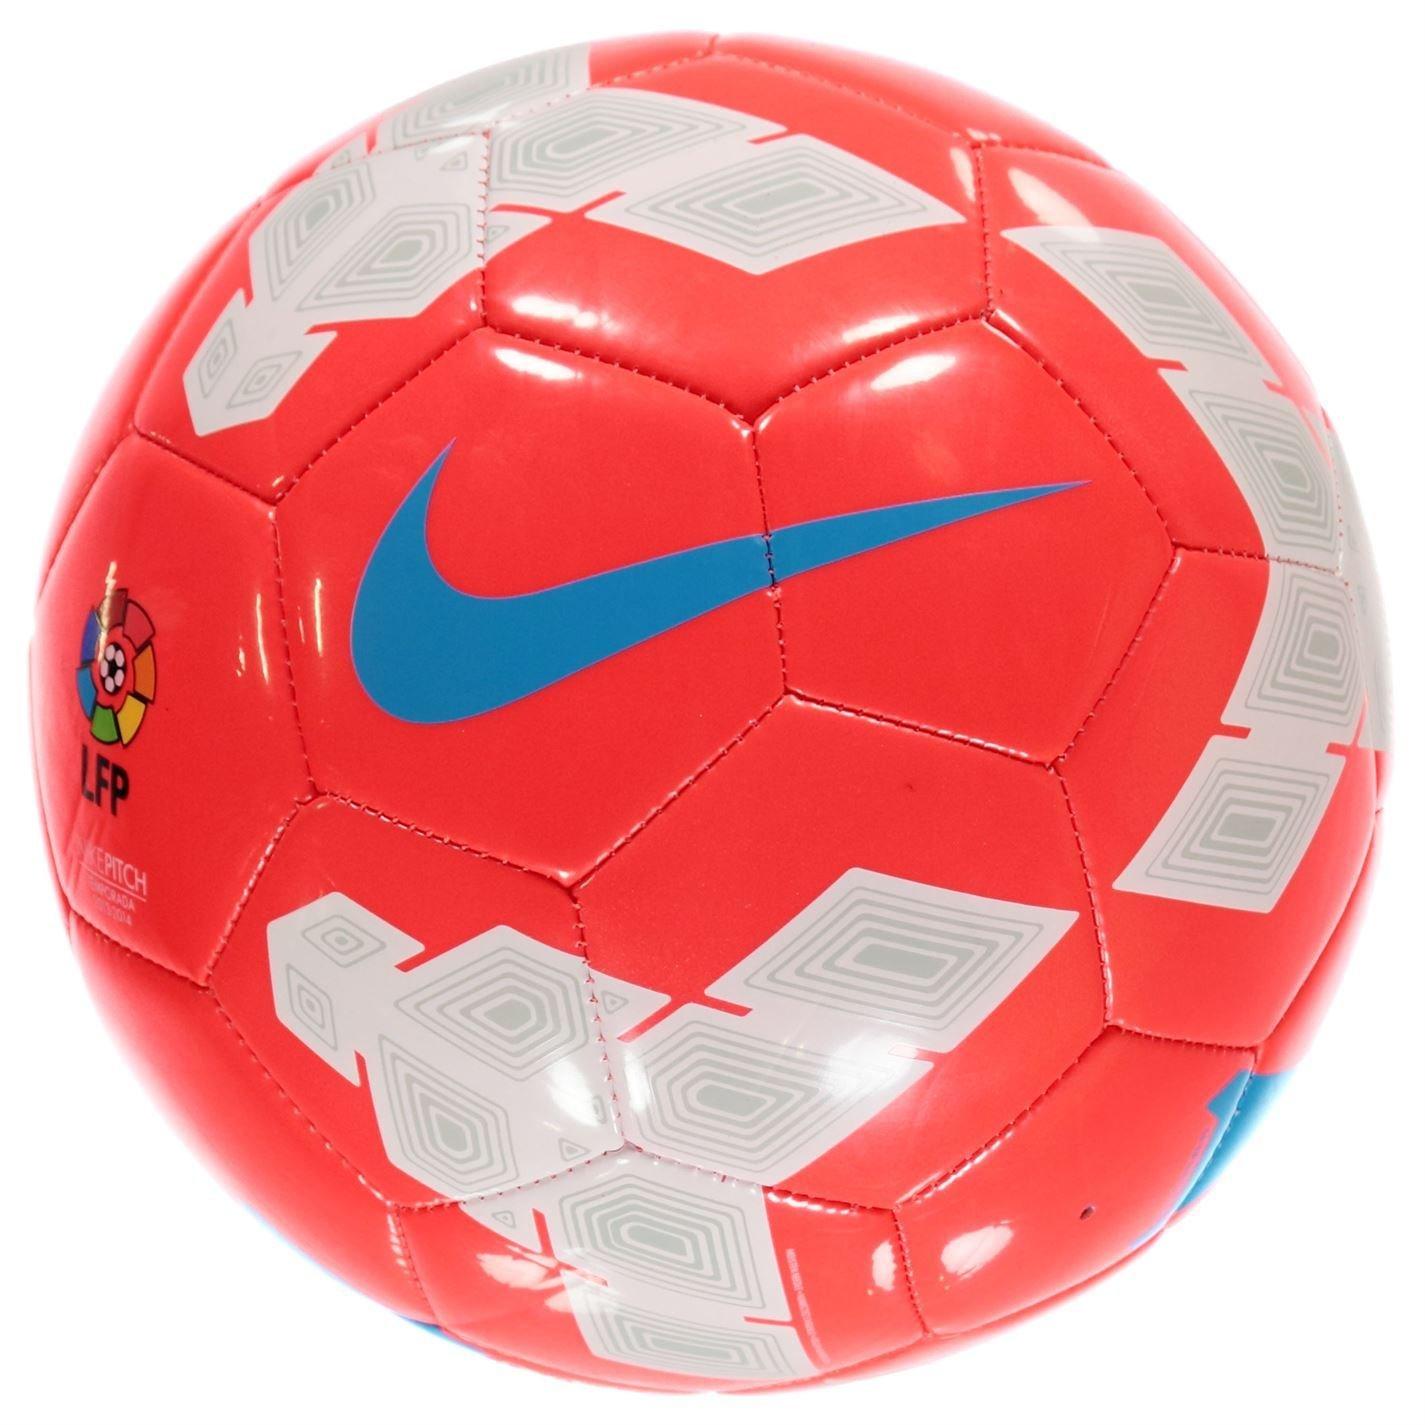 Nike Pitch LFP – Balón de fútbol de la Liga 2013 2014 rojo/blanco ...